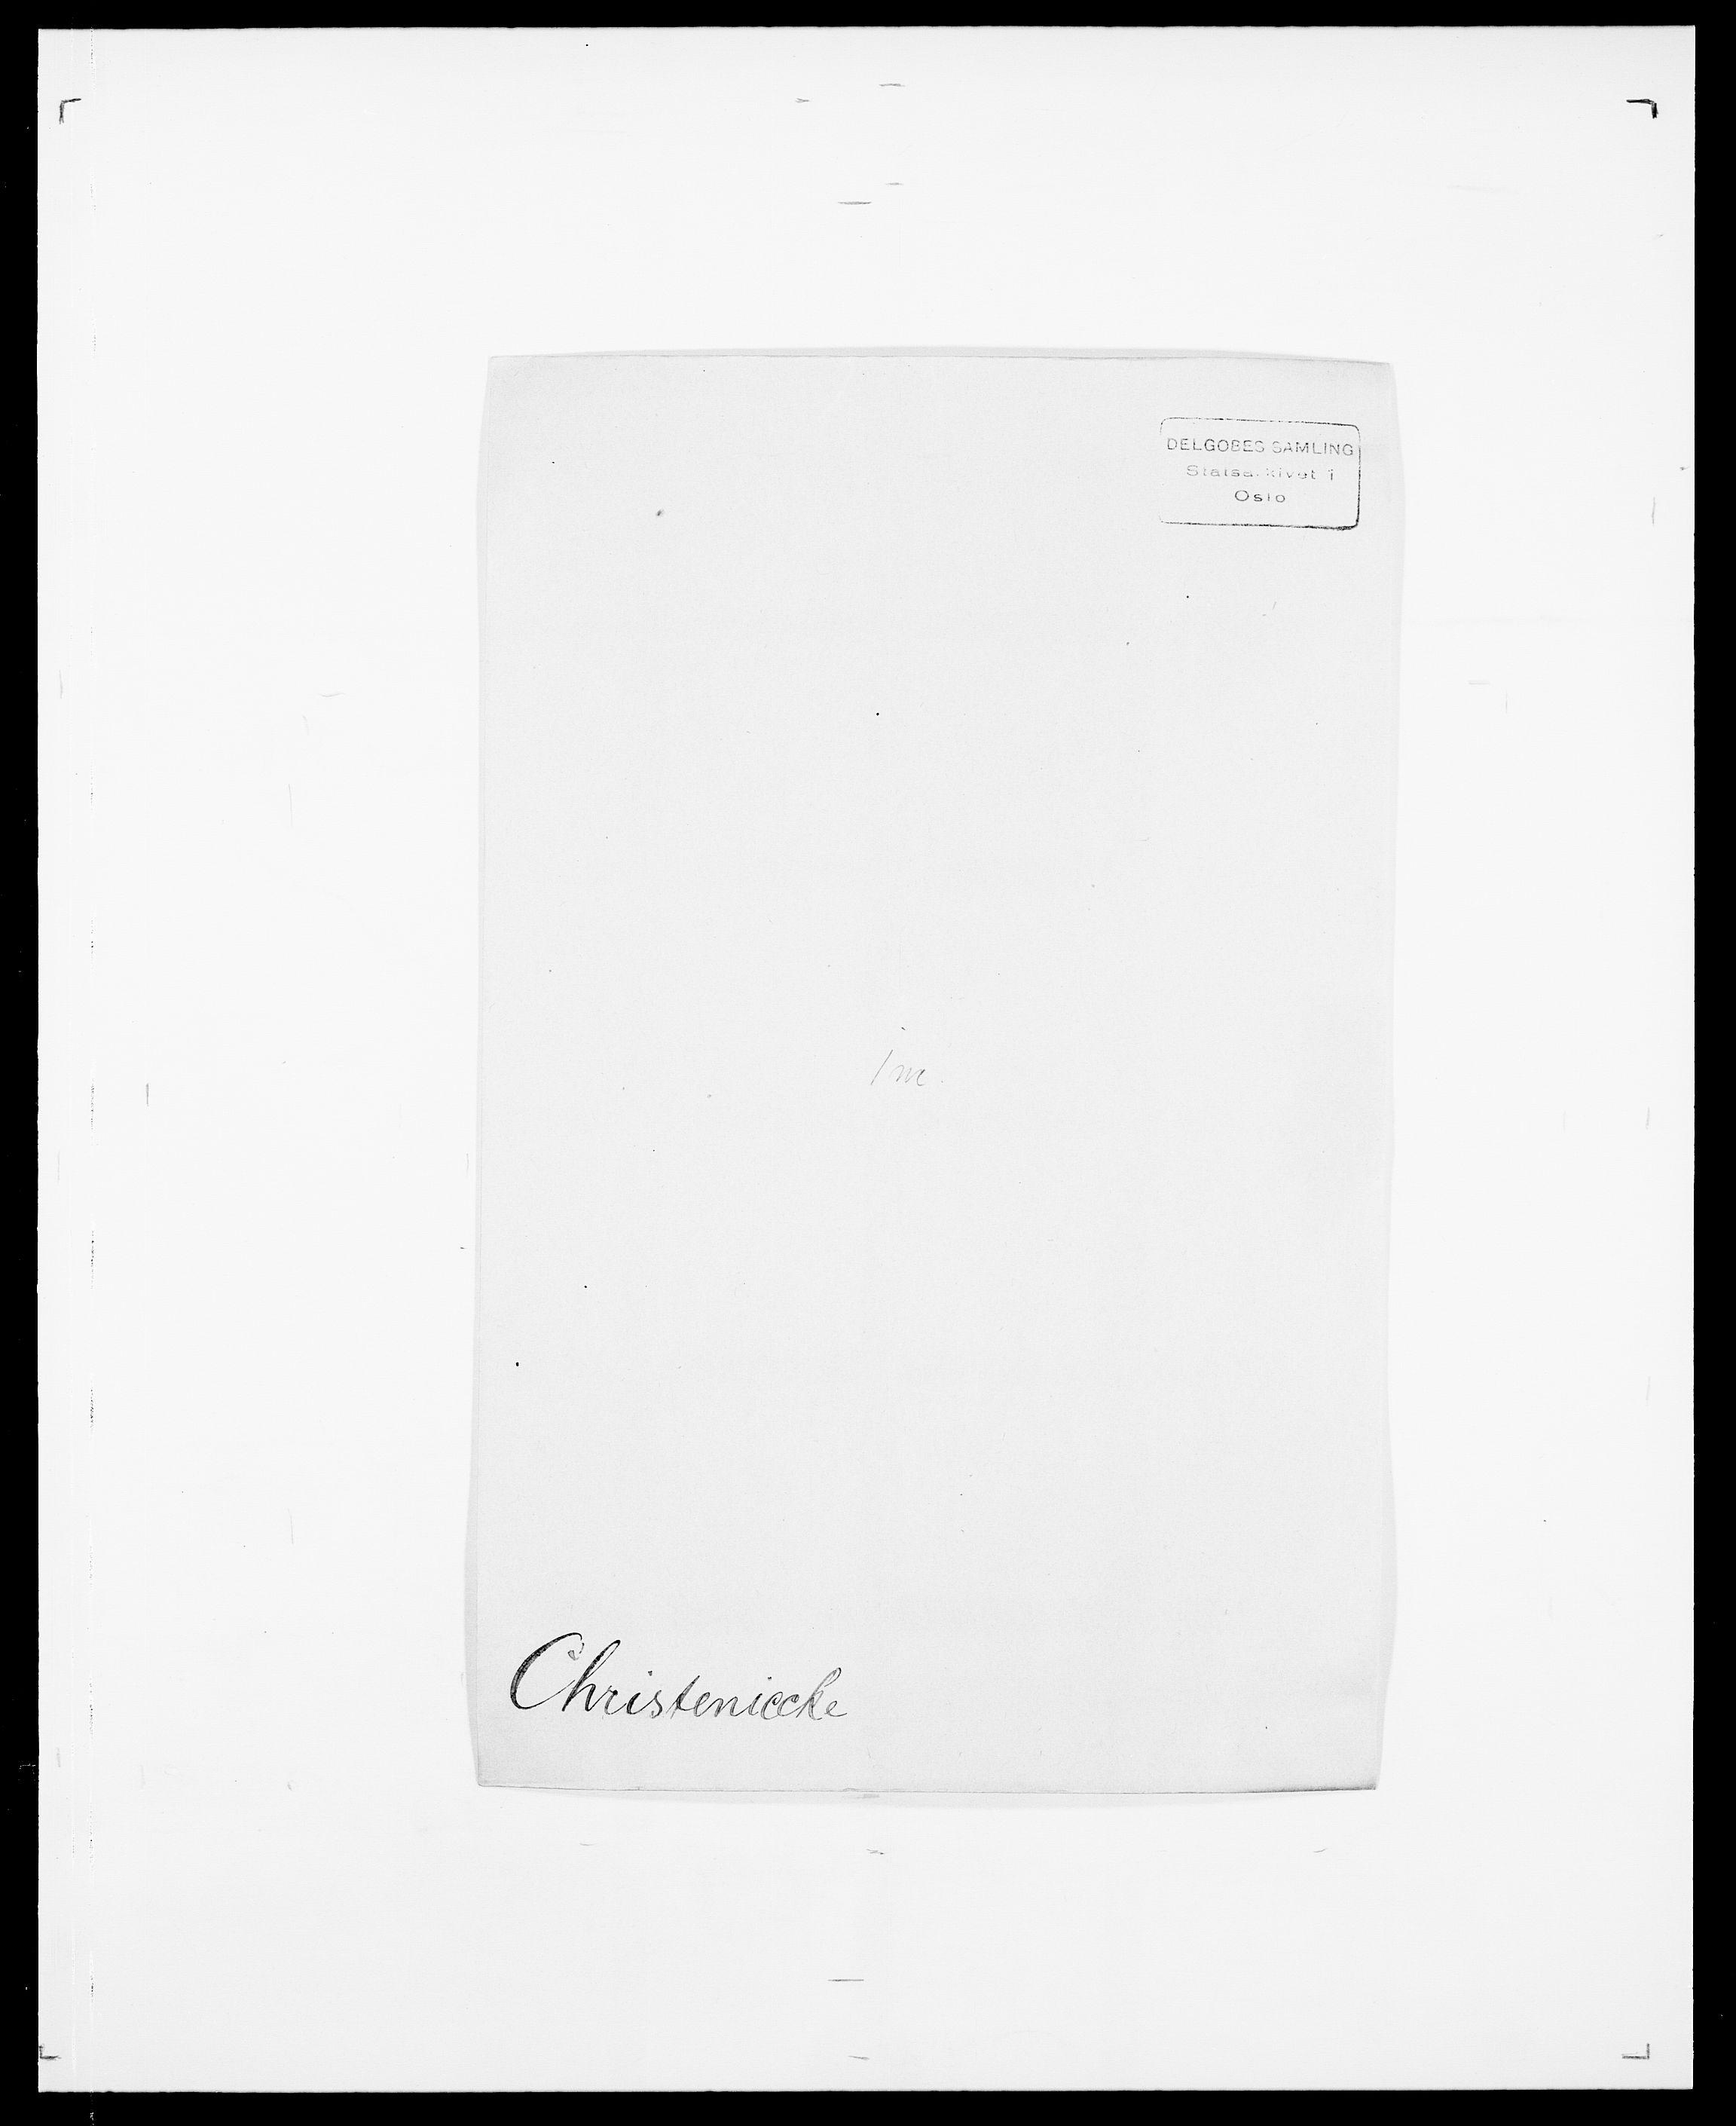 SAO, Delgobe, Charles Antoine - samling, D/Da/L0008: Capjon - Dagenbolt, s. 184